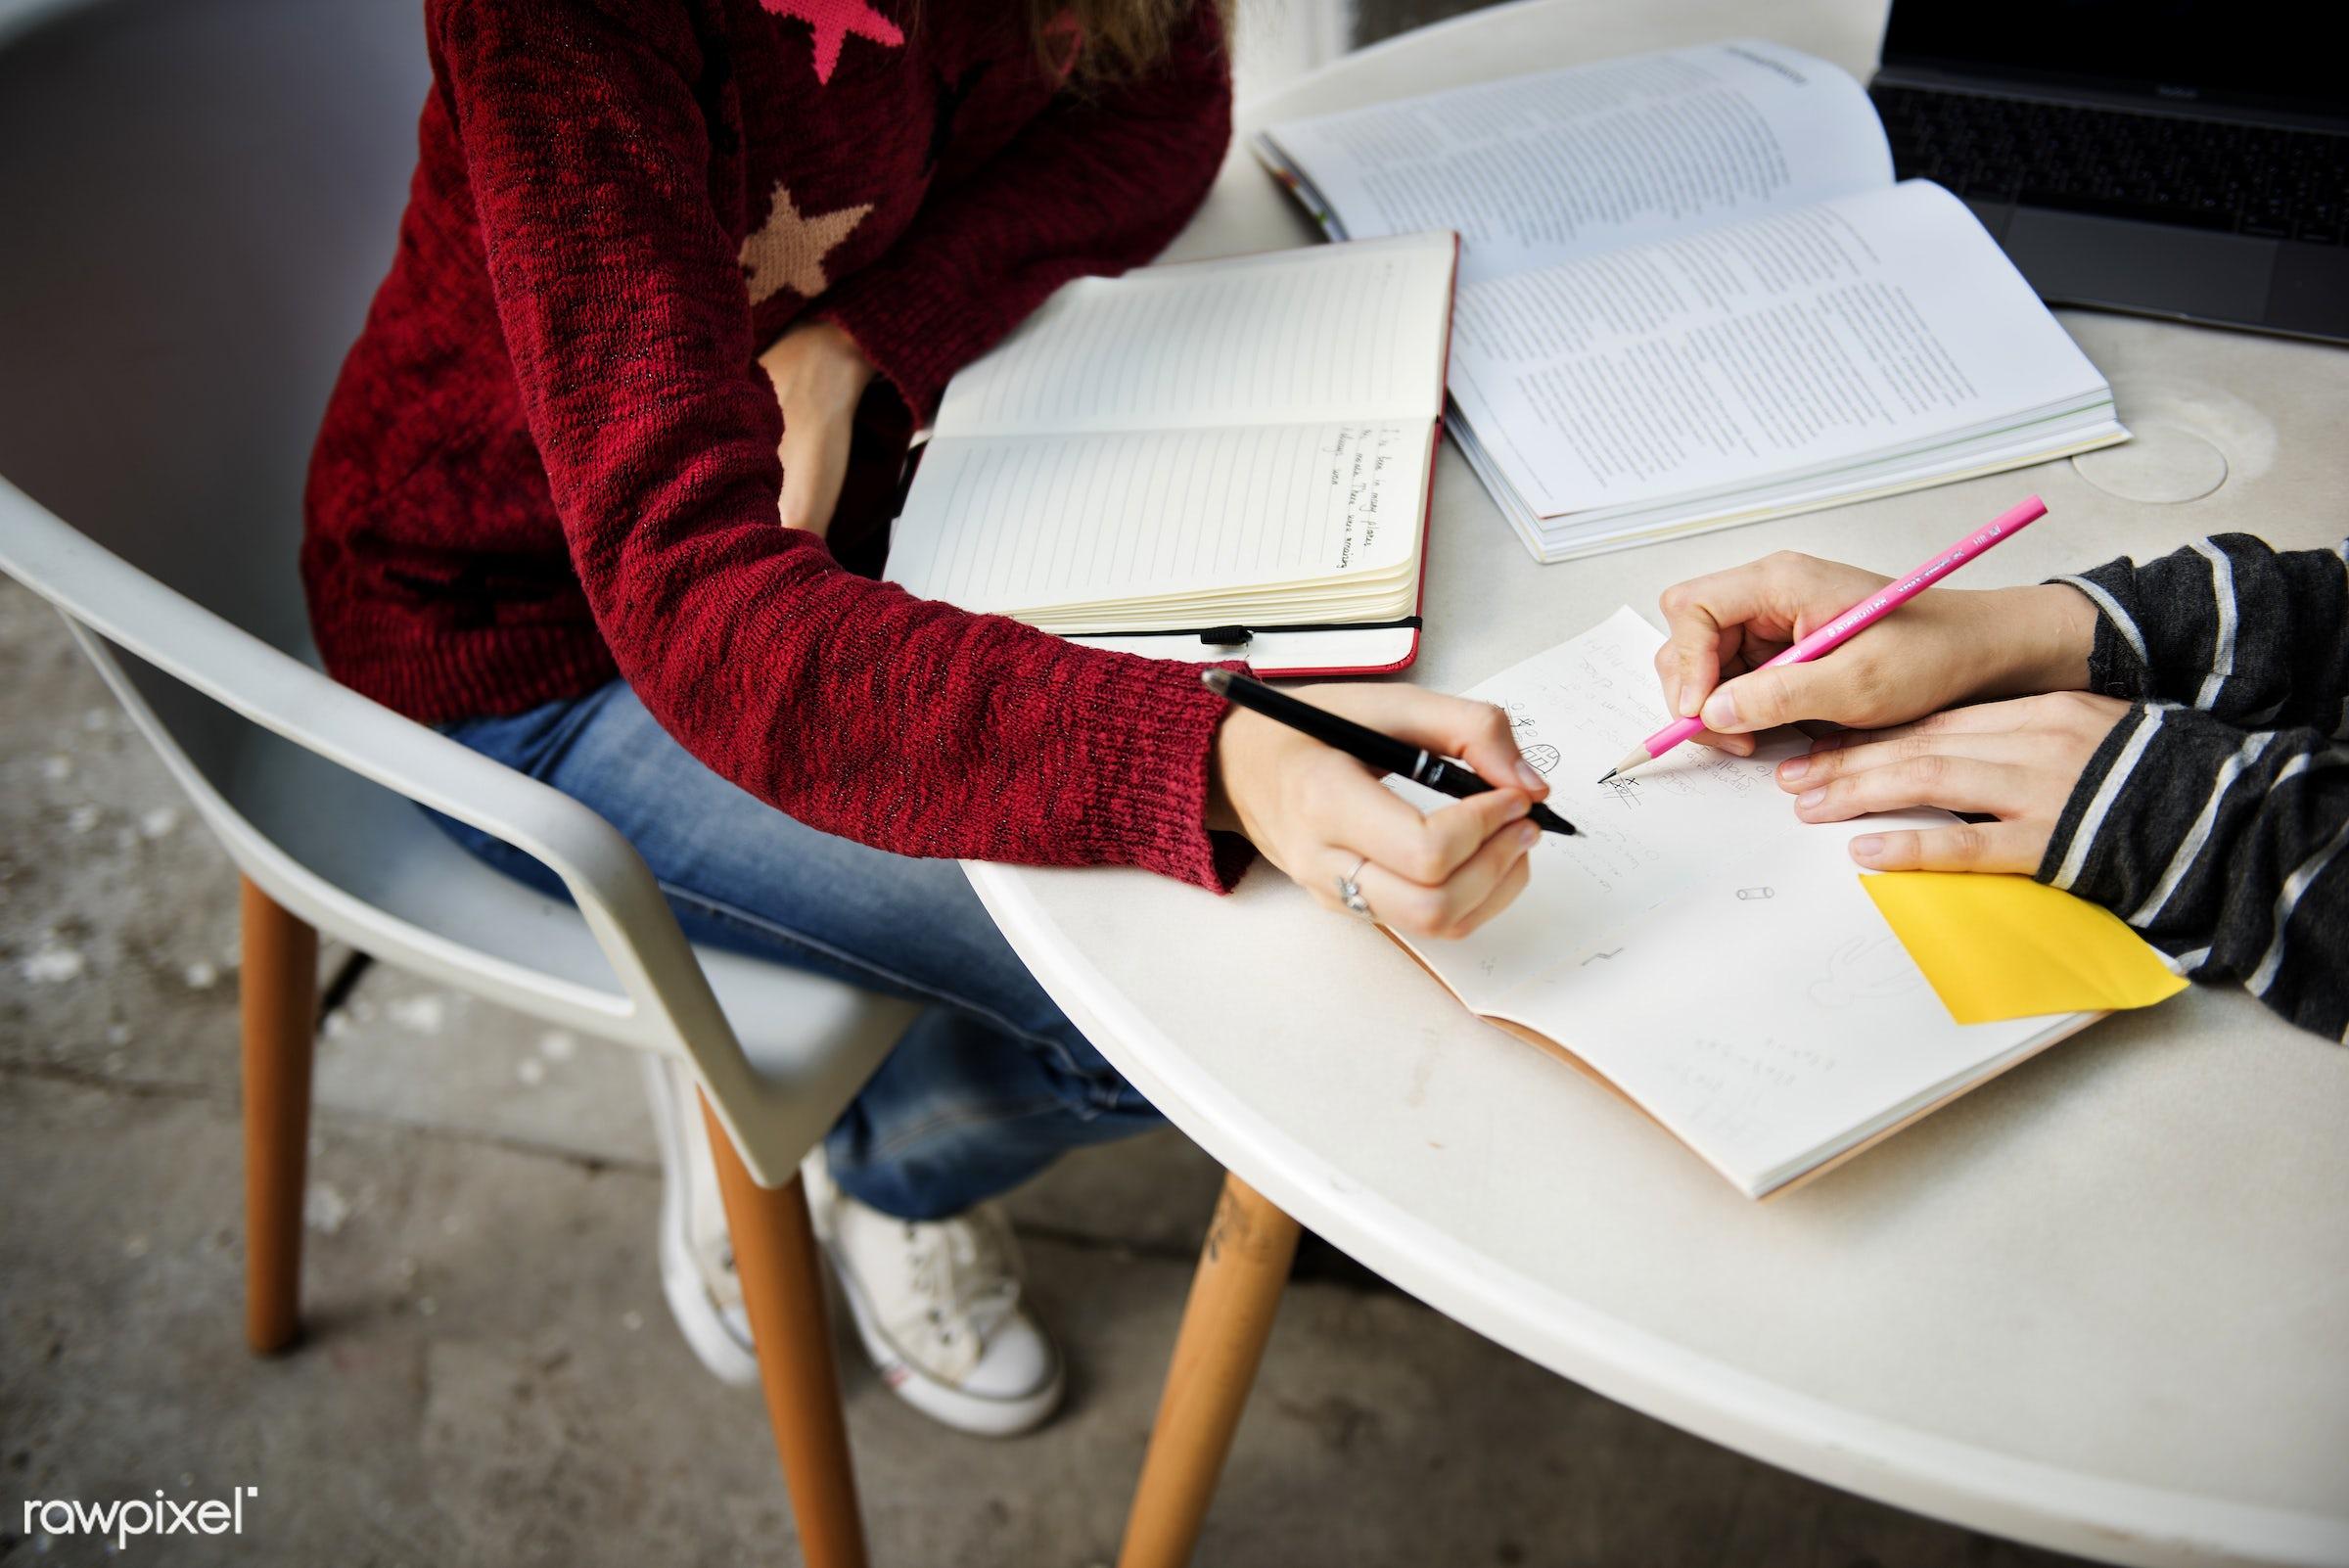 analysing, analysis, bonding, book, brainstorming, campus, casual, caucasian, college, communication, conversation,...